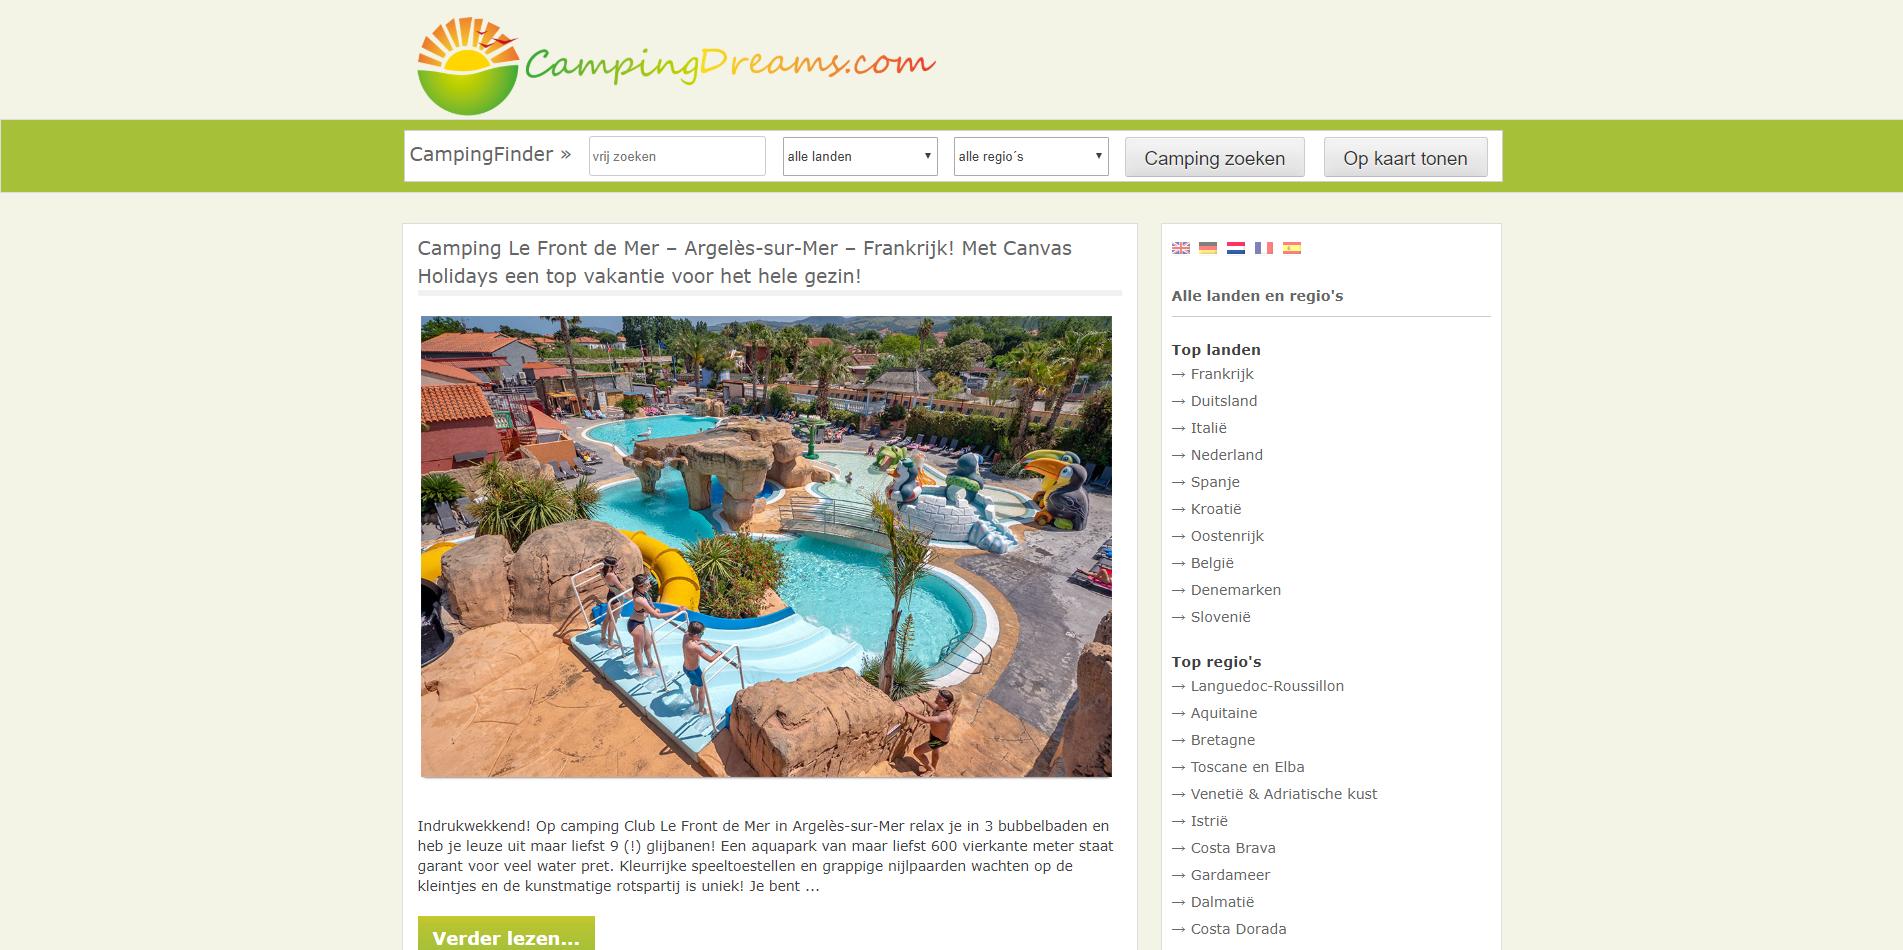 CampingDreams website - Blogs4Travel